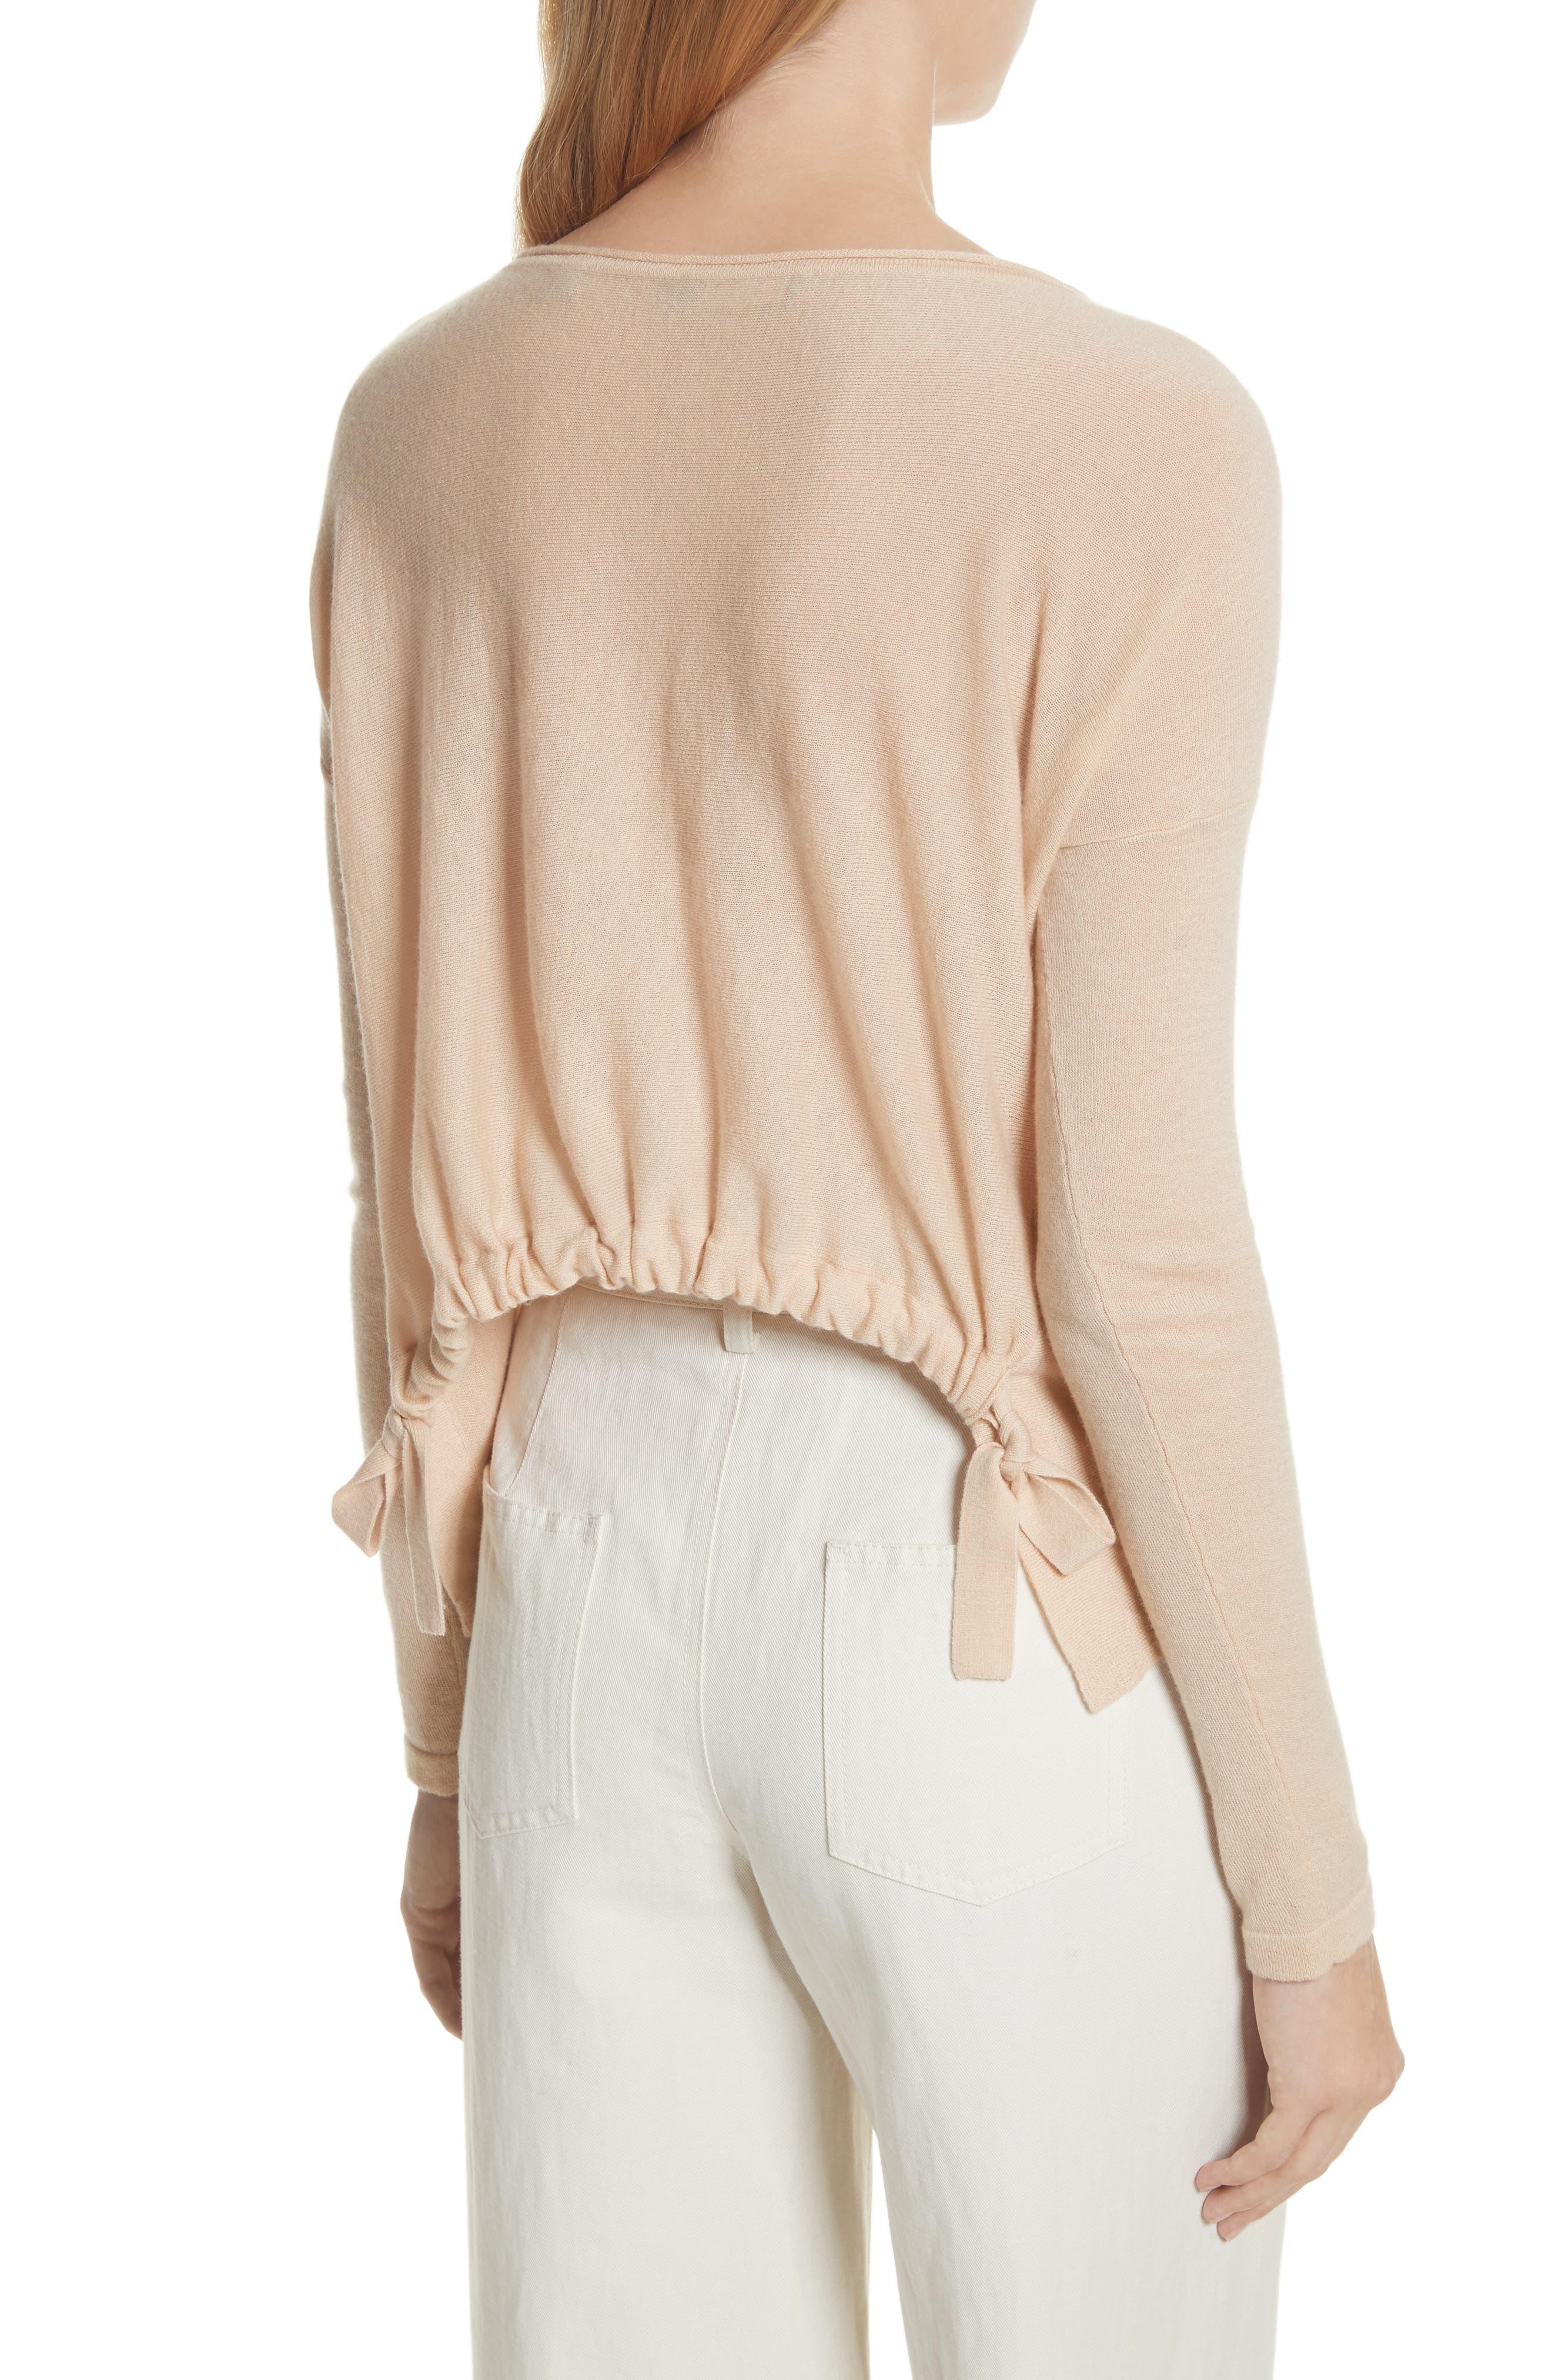 VINCE,                             Cinched Back Cashmere Sweater,                             Alternate thumbnail 2, color,                             298